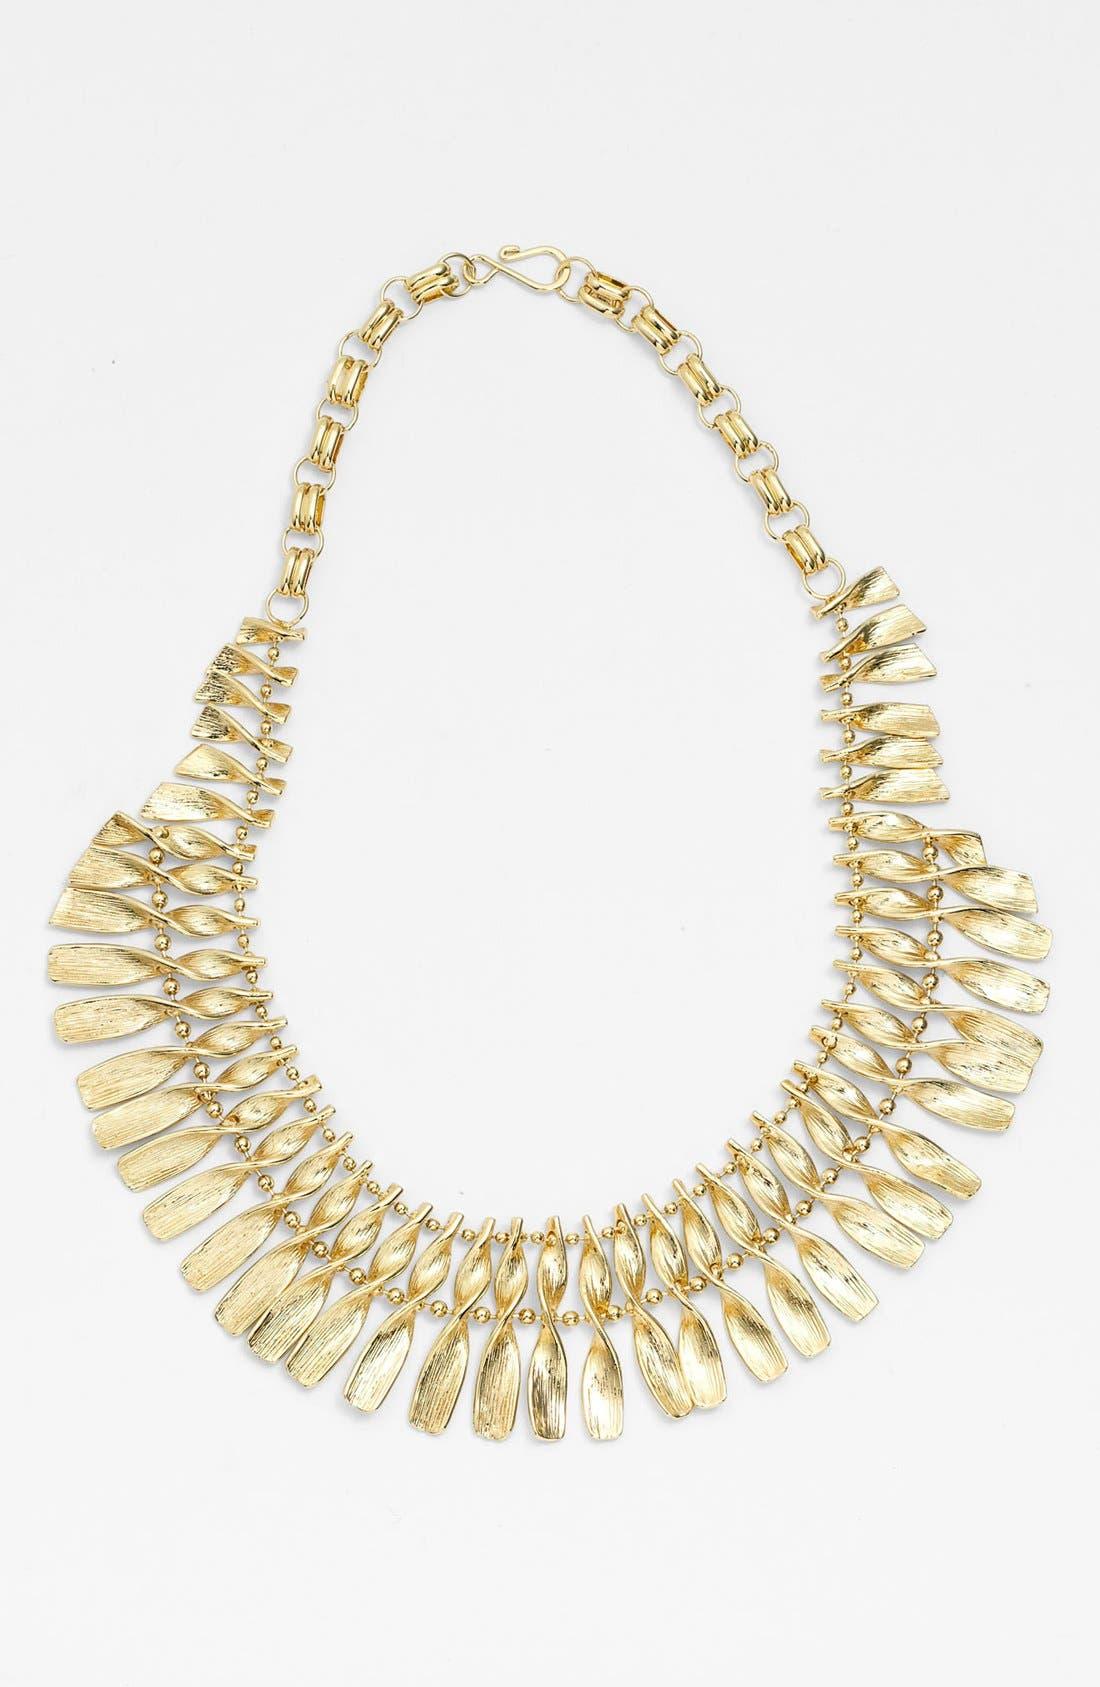 Main Image - Kendra Scott 'Sandy' Bib Necklace